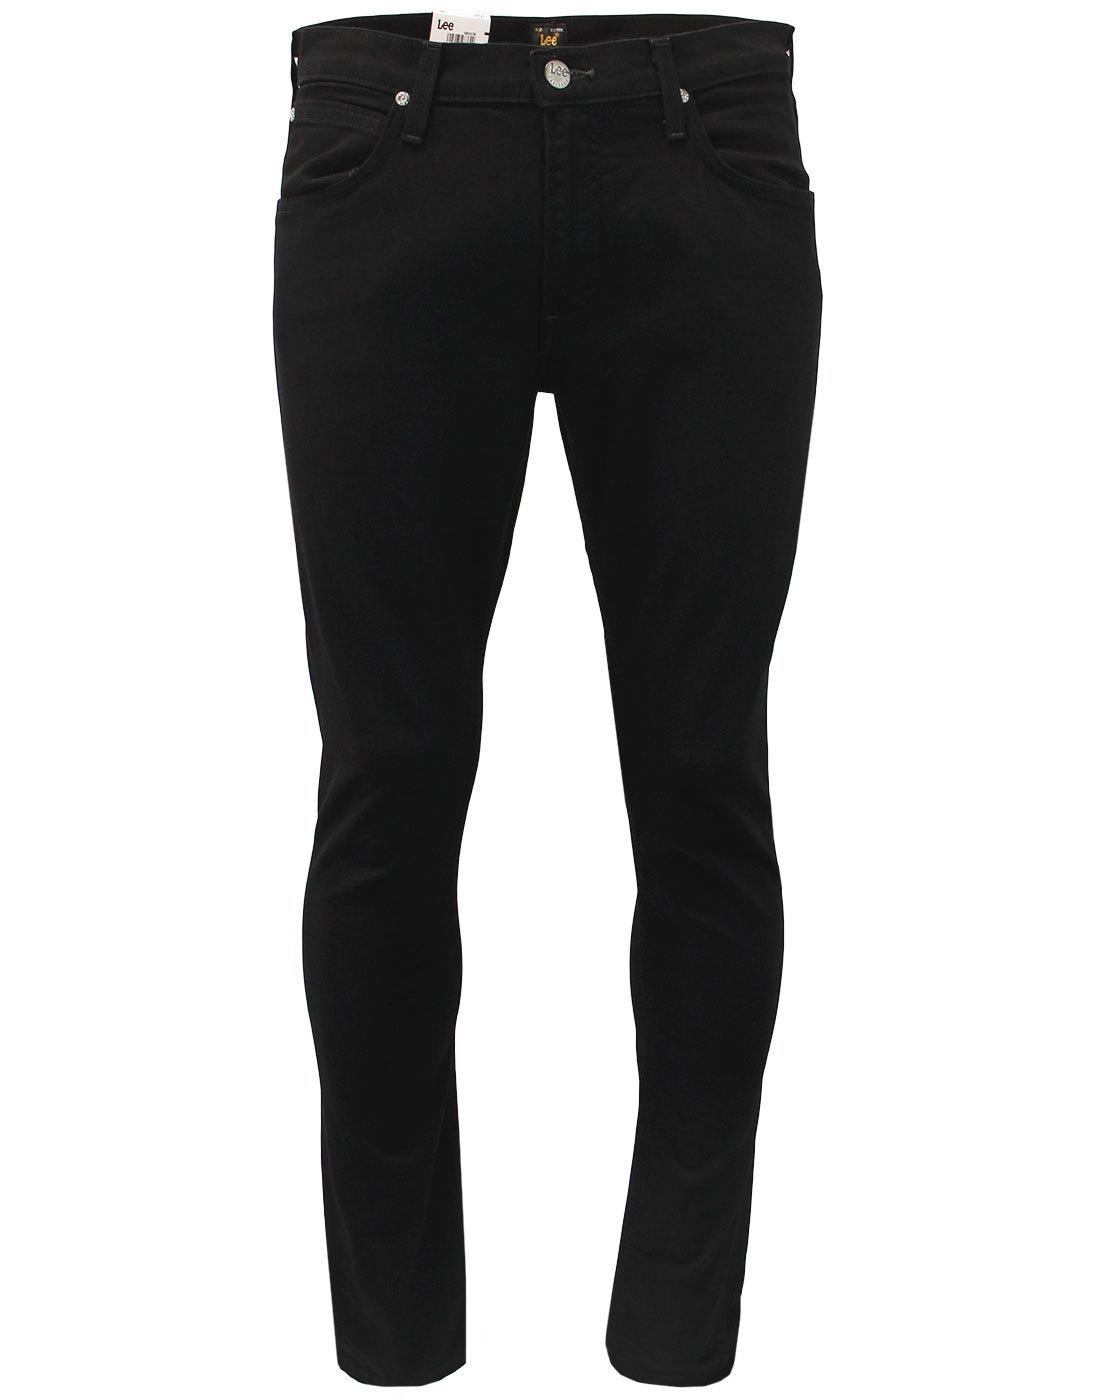 05afeadd LEE Luke Men's Retro Mod Slim Tapered Denim Jeans in Clean Black